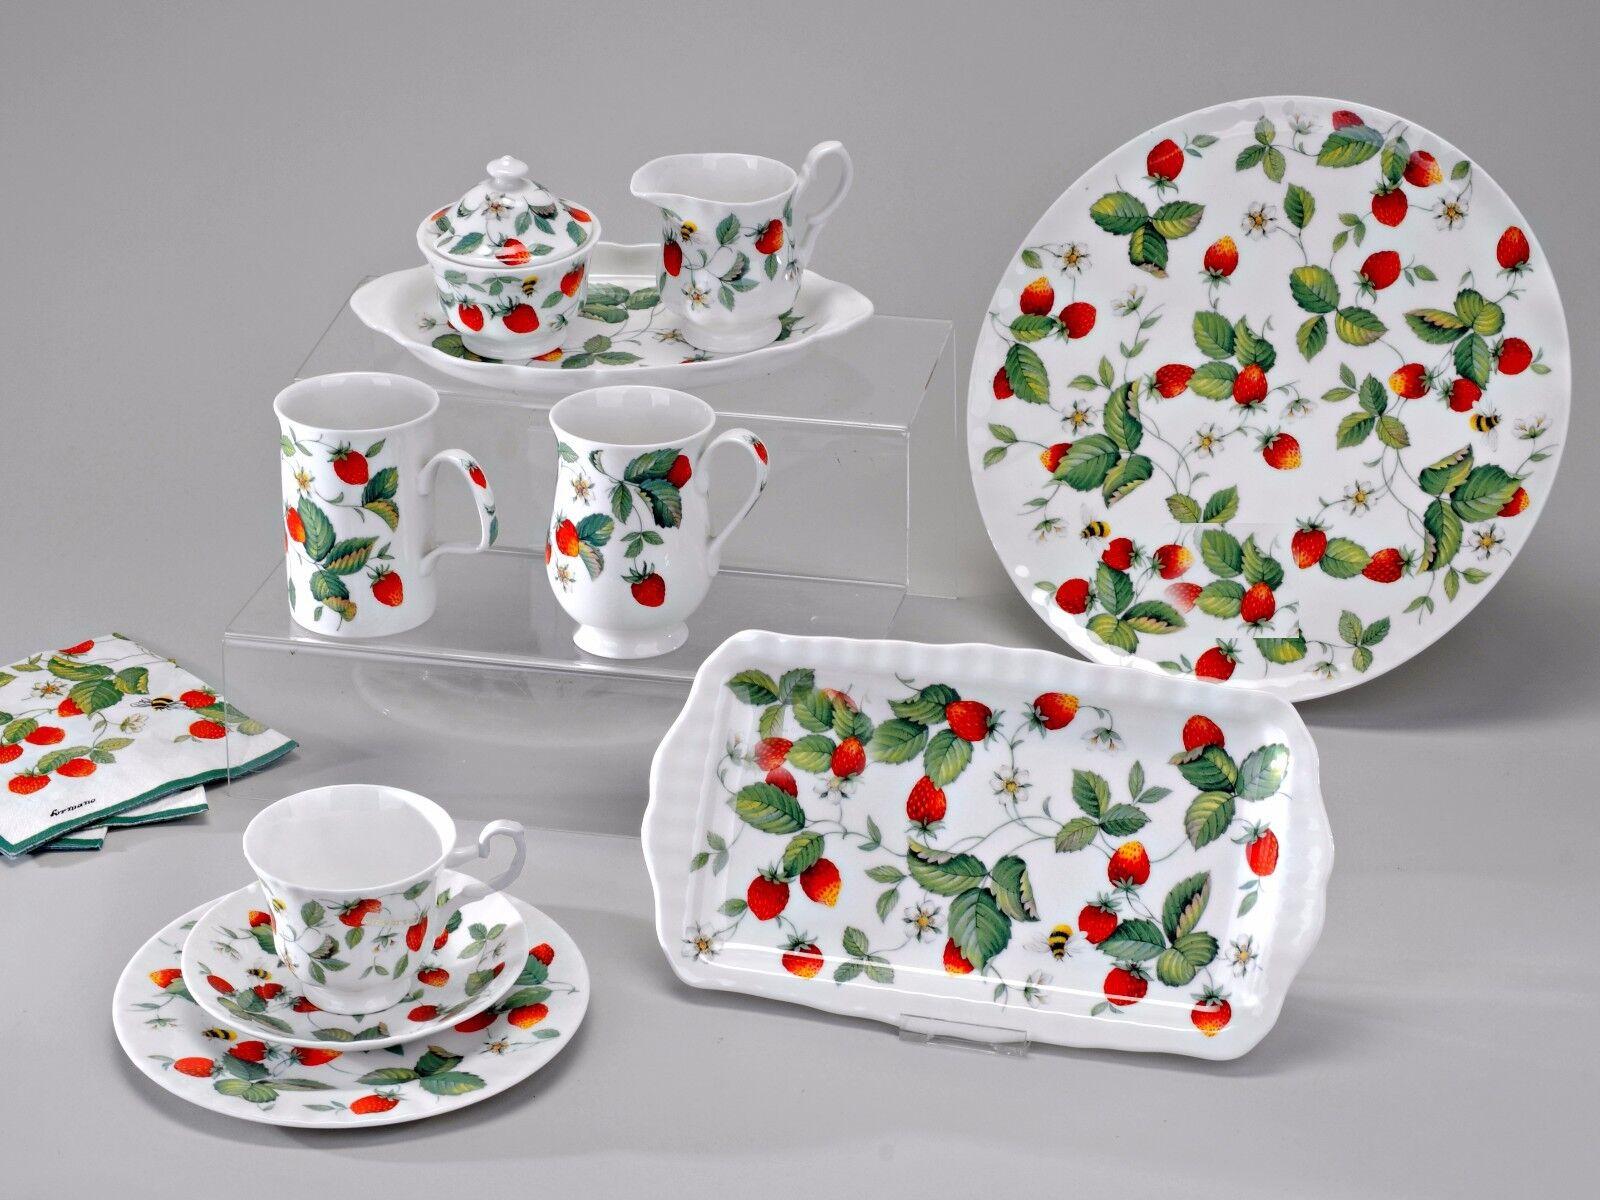 Roy Kirkham Alpine Strawberry Teekanne 0,90 0,90 0,90 ltr. 965301   Guter weltweiter Ruf  0595d6